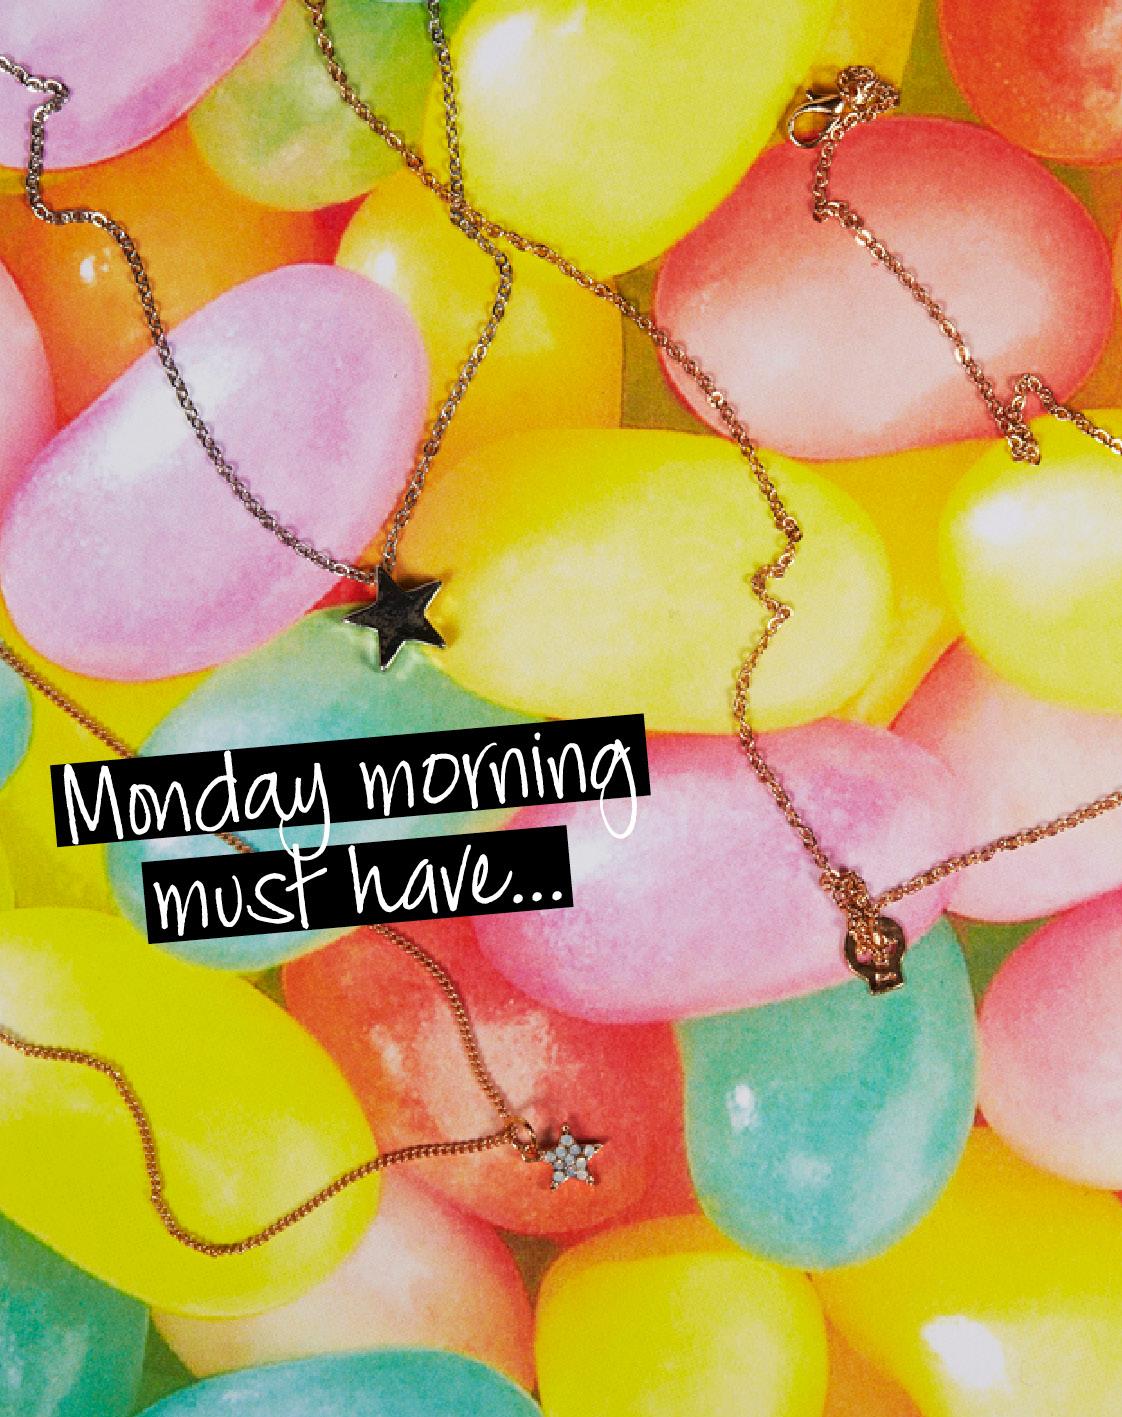 MondayNecklce